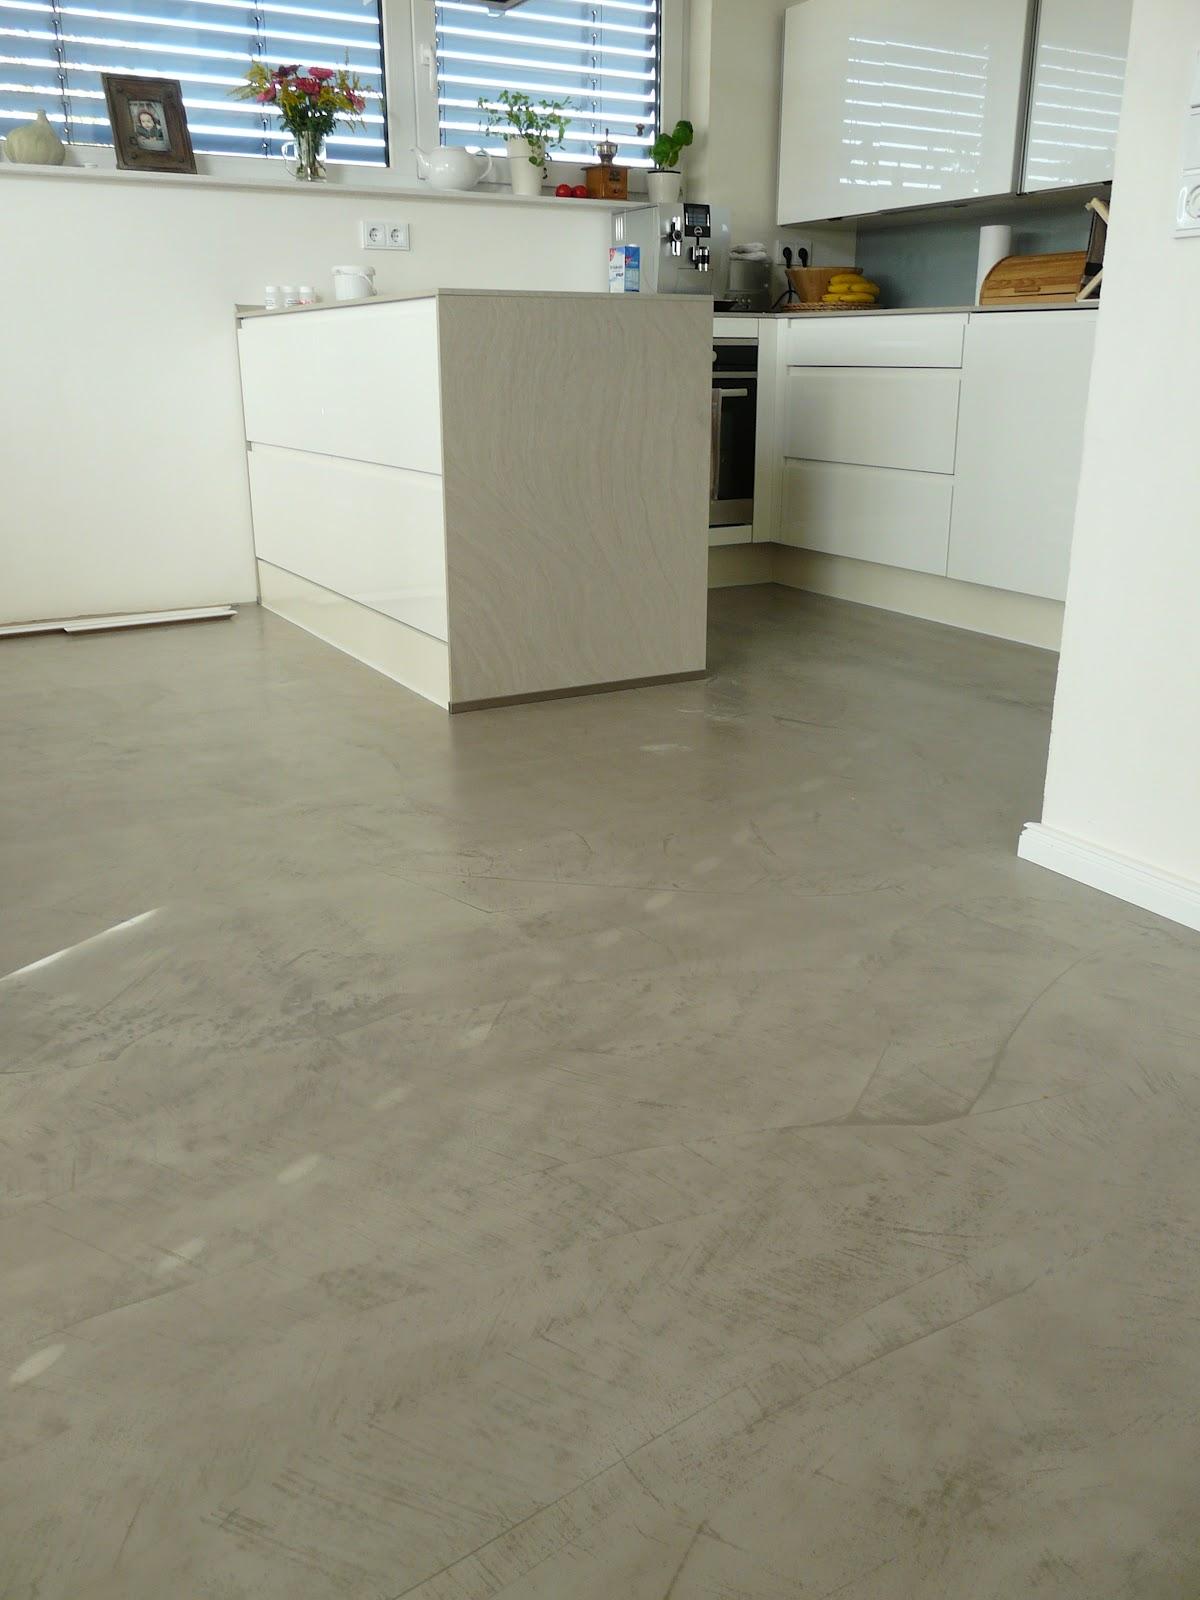 wand wohndesign beton cire beton floor. Black Bedroom Furniture Sets. Home Design Ideas